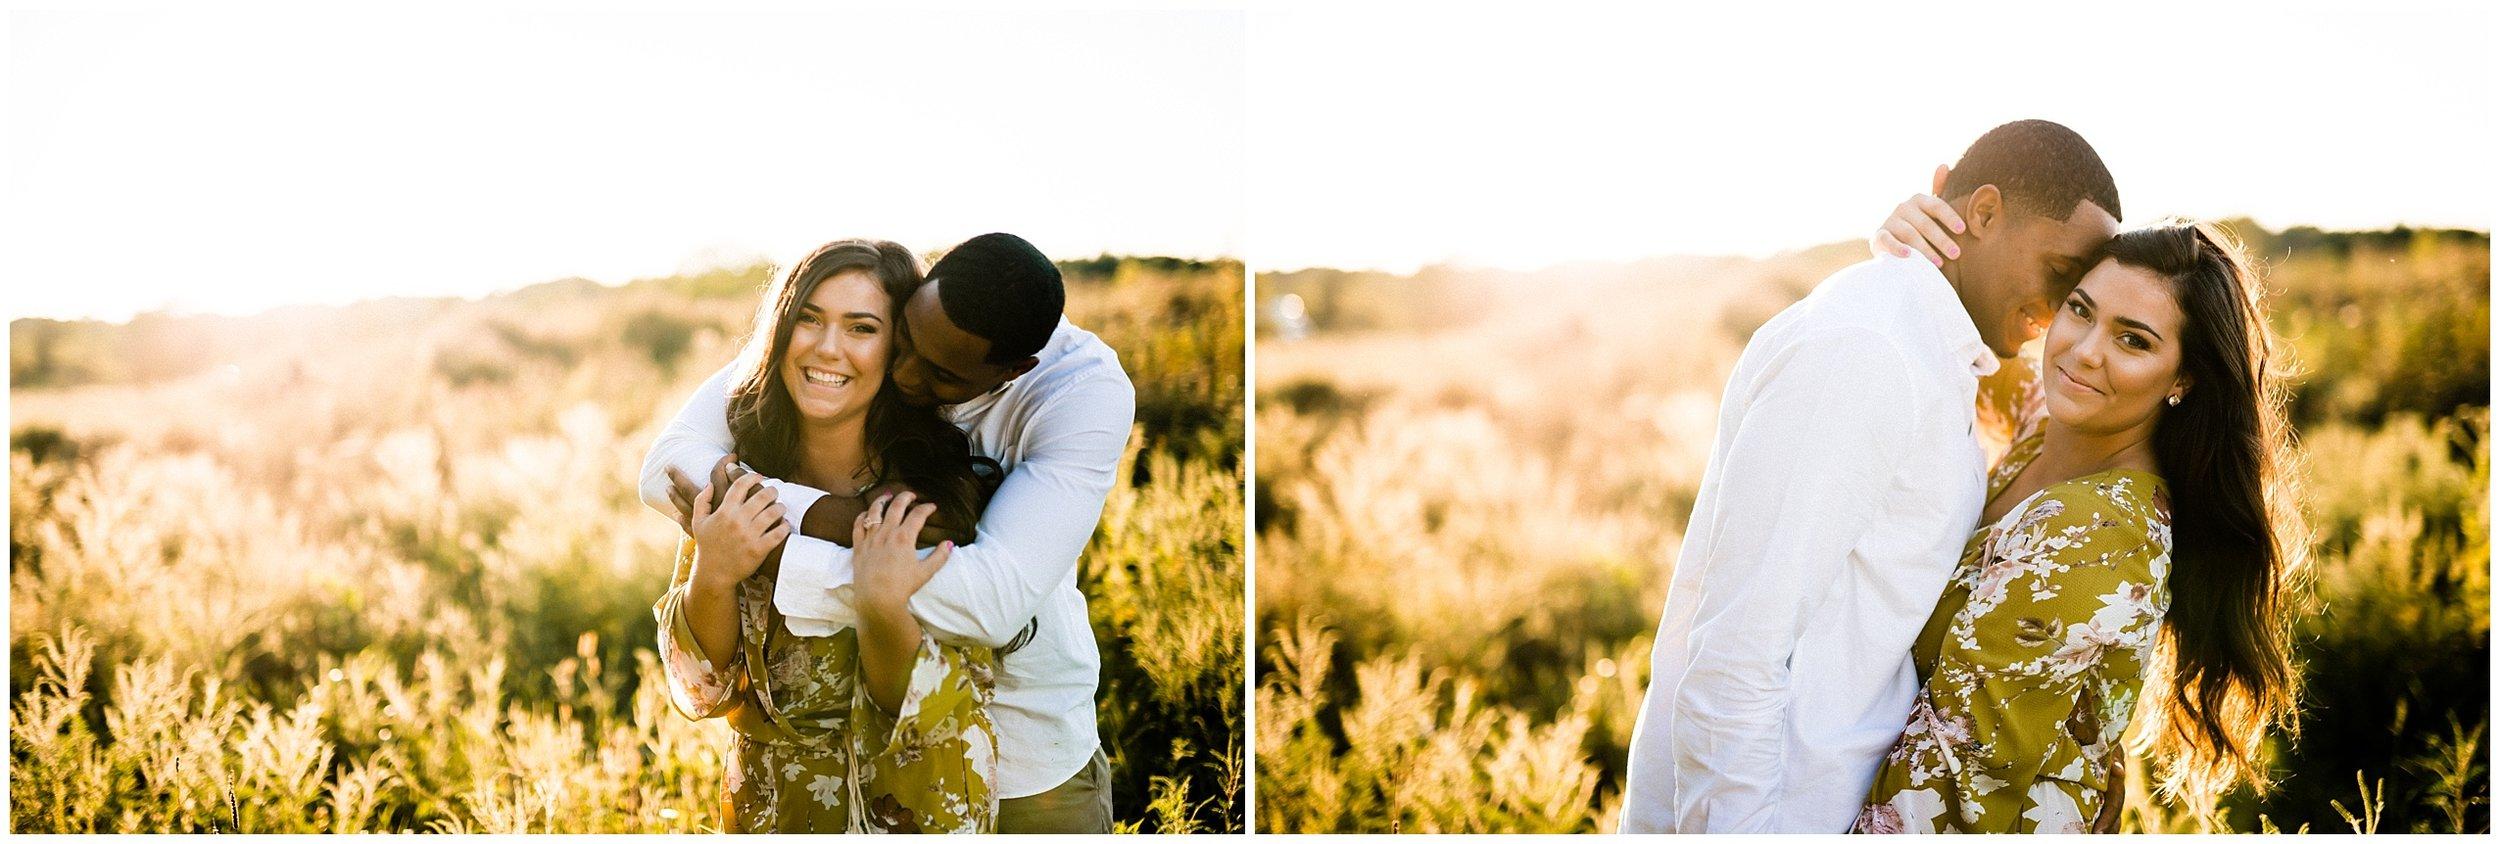 Tabias + Zabrea | Engaged  #kyleepaigephotography_0665.jpg